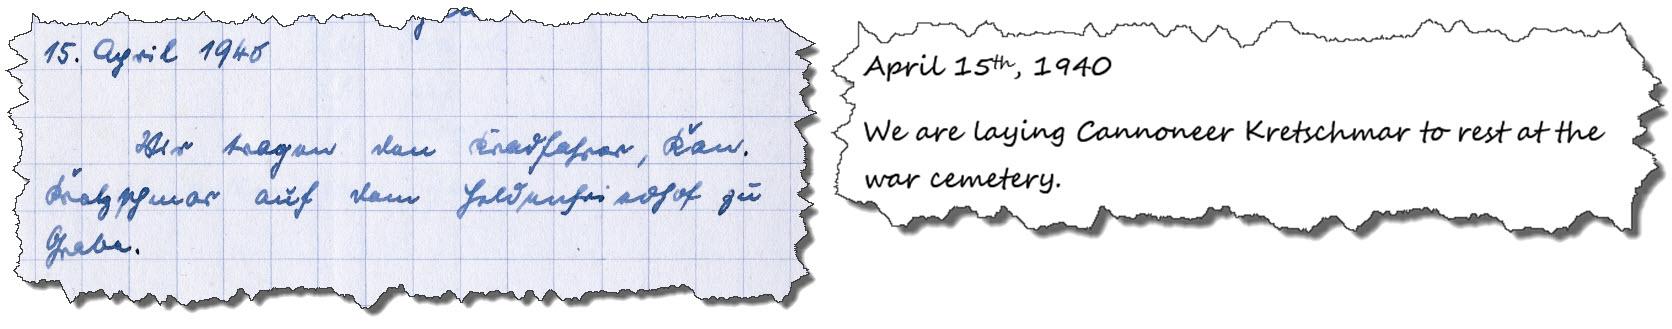 1940-04-15